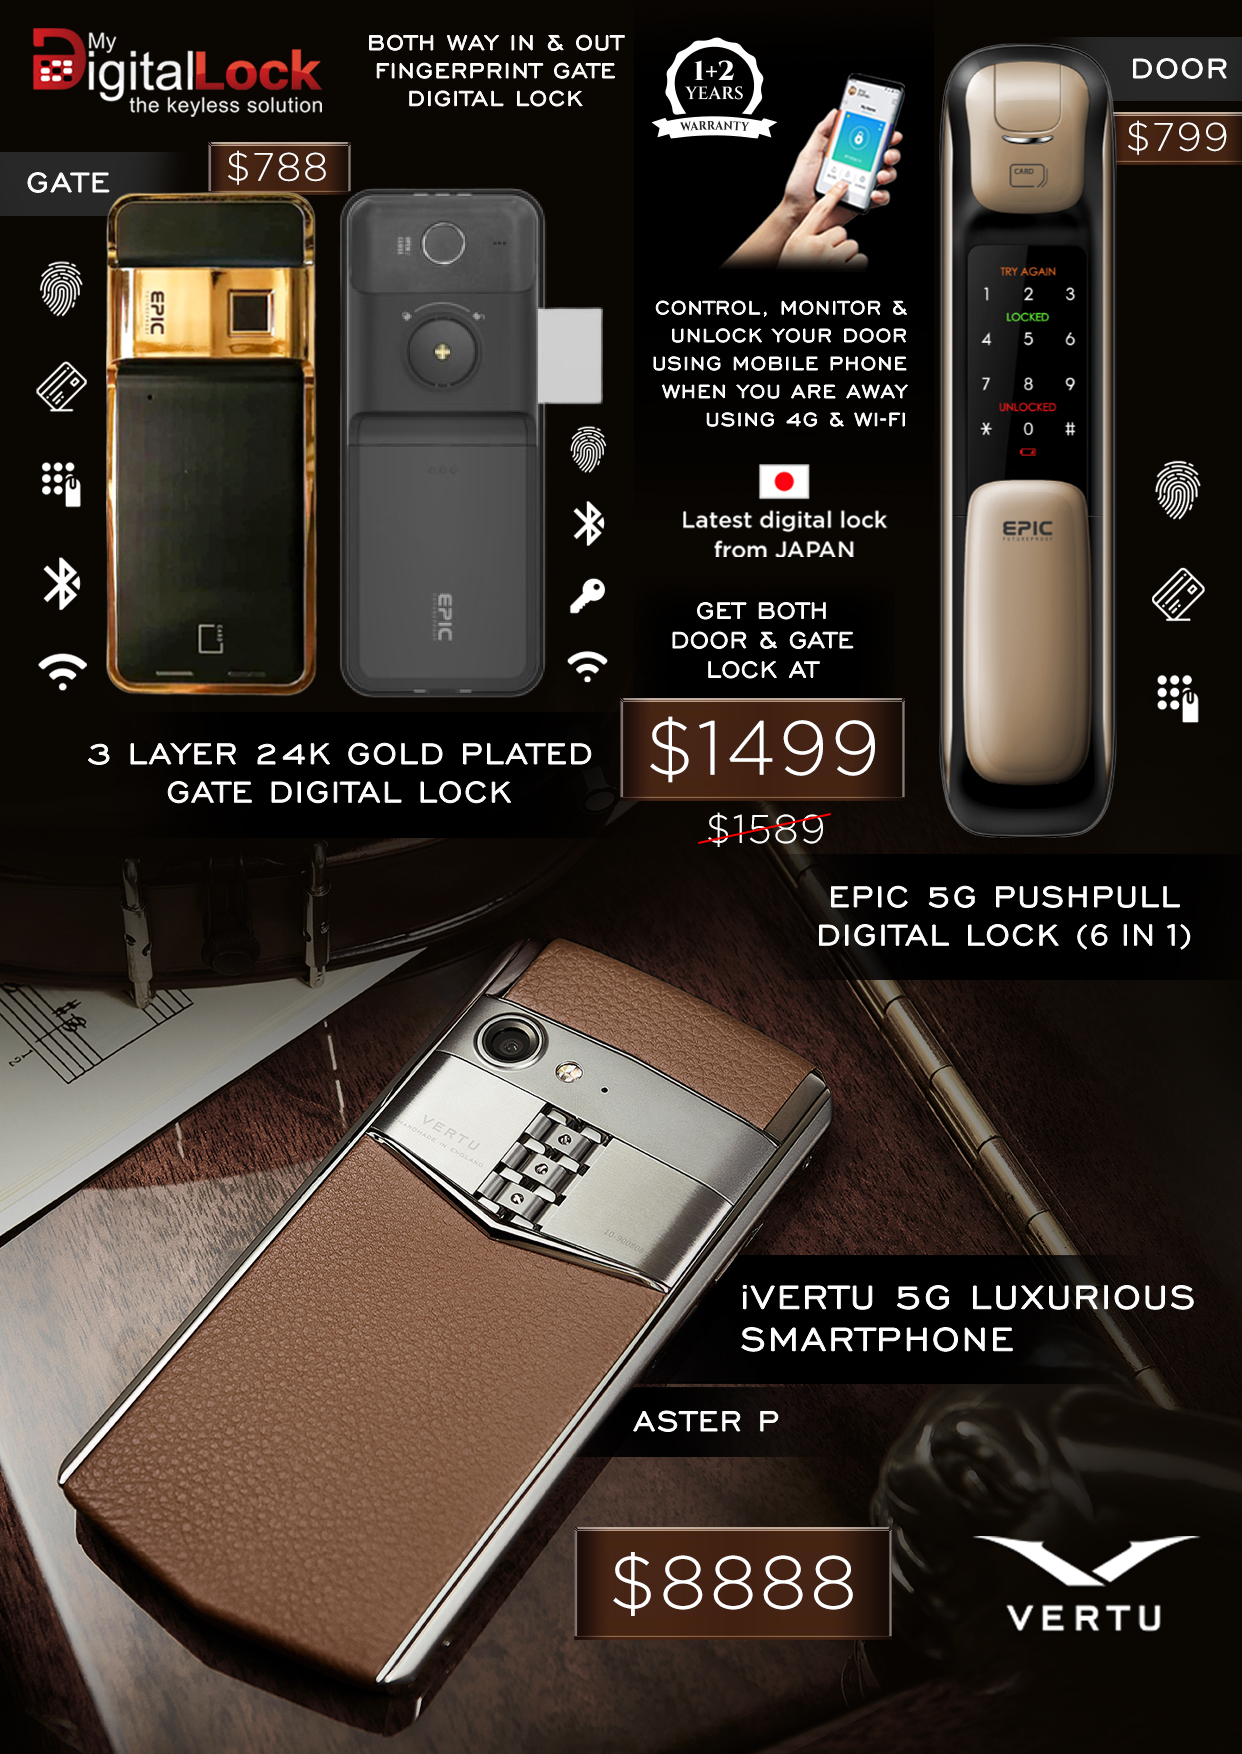 Unlock-the-HDB-Door-Gate-Using-Fingerprint-iVertu-Smartphone-Promotions_2021